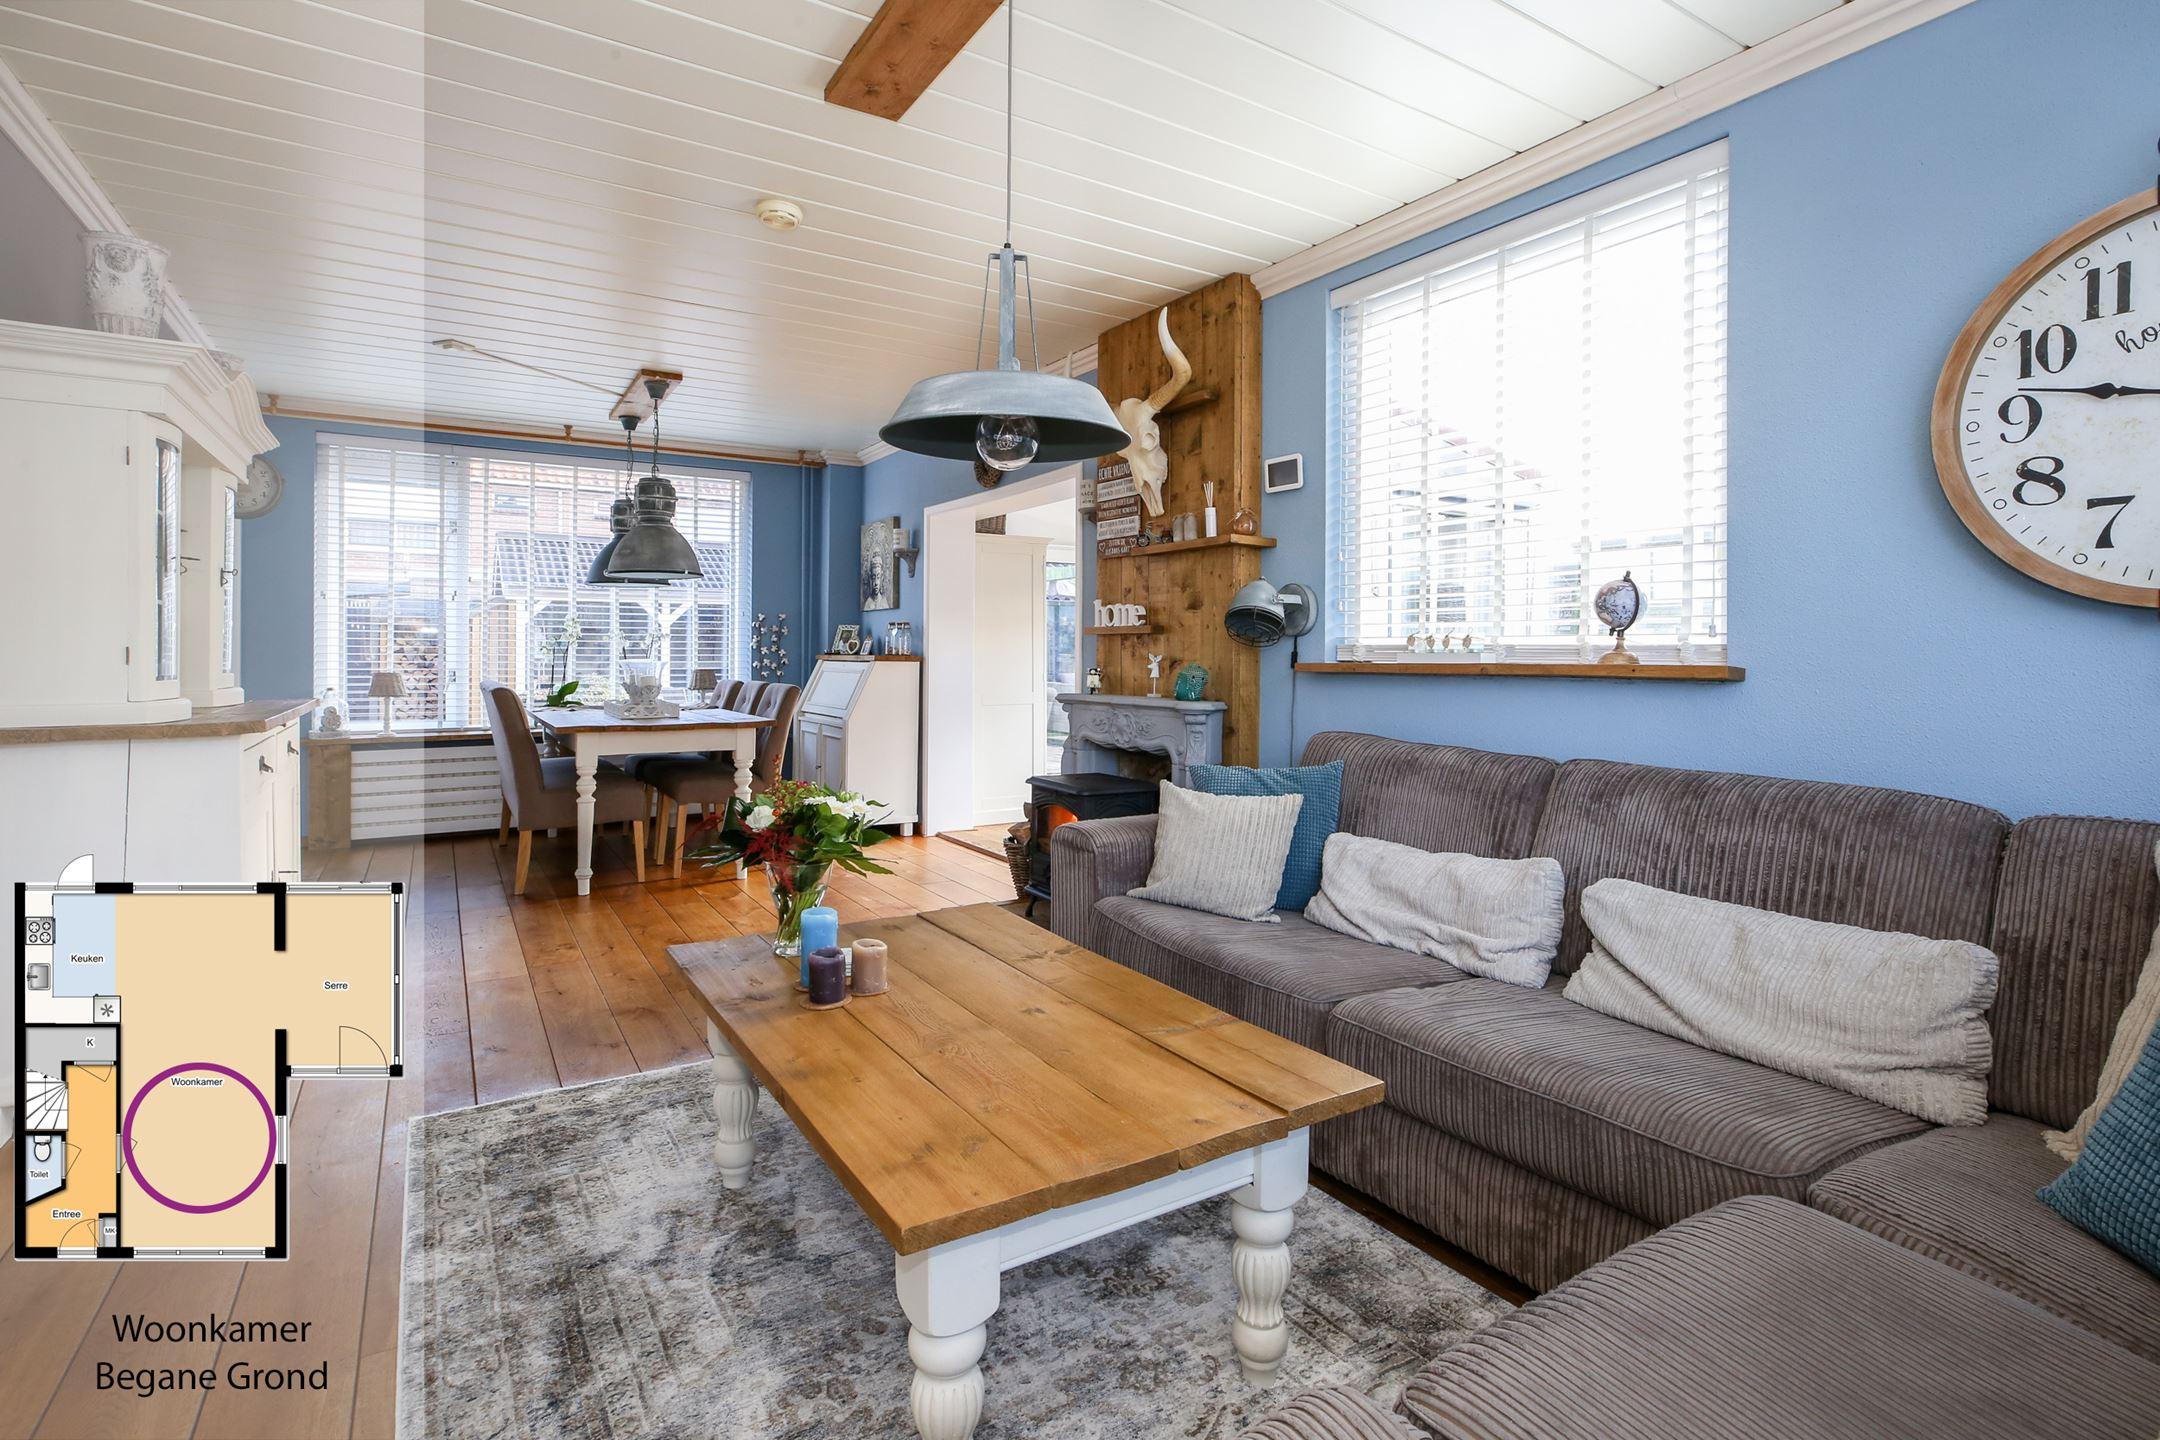 House for sale daniël willemsstraat cg